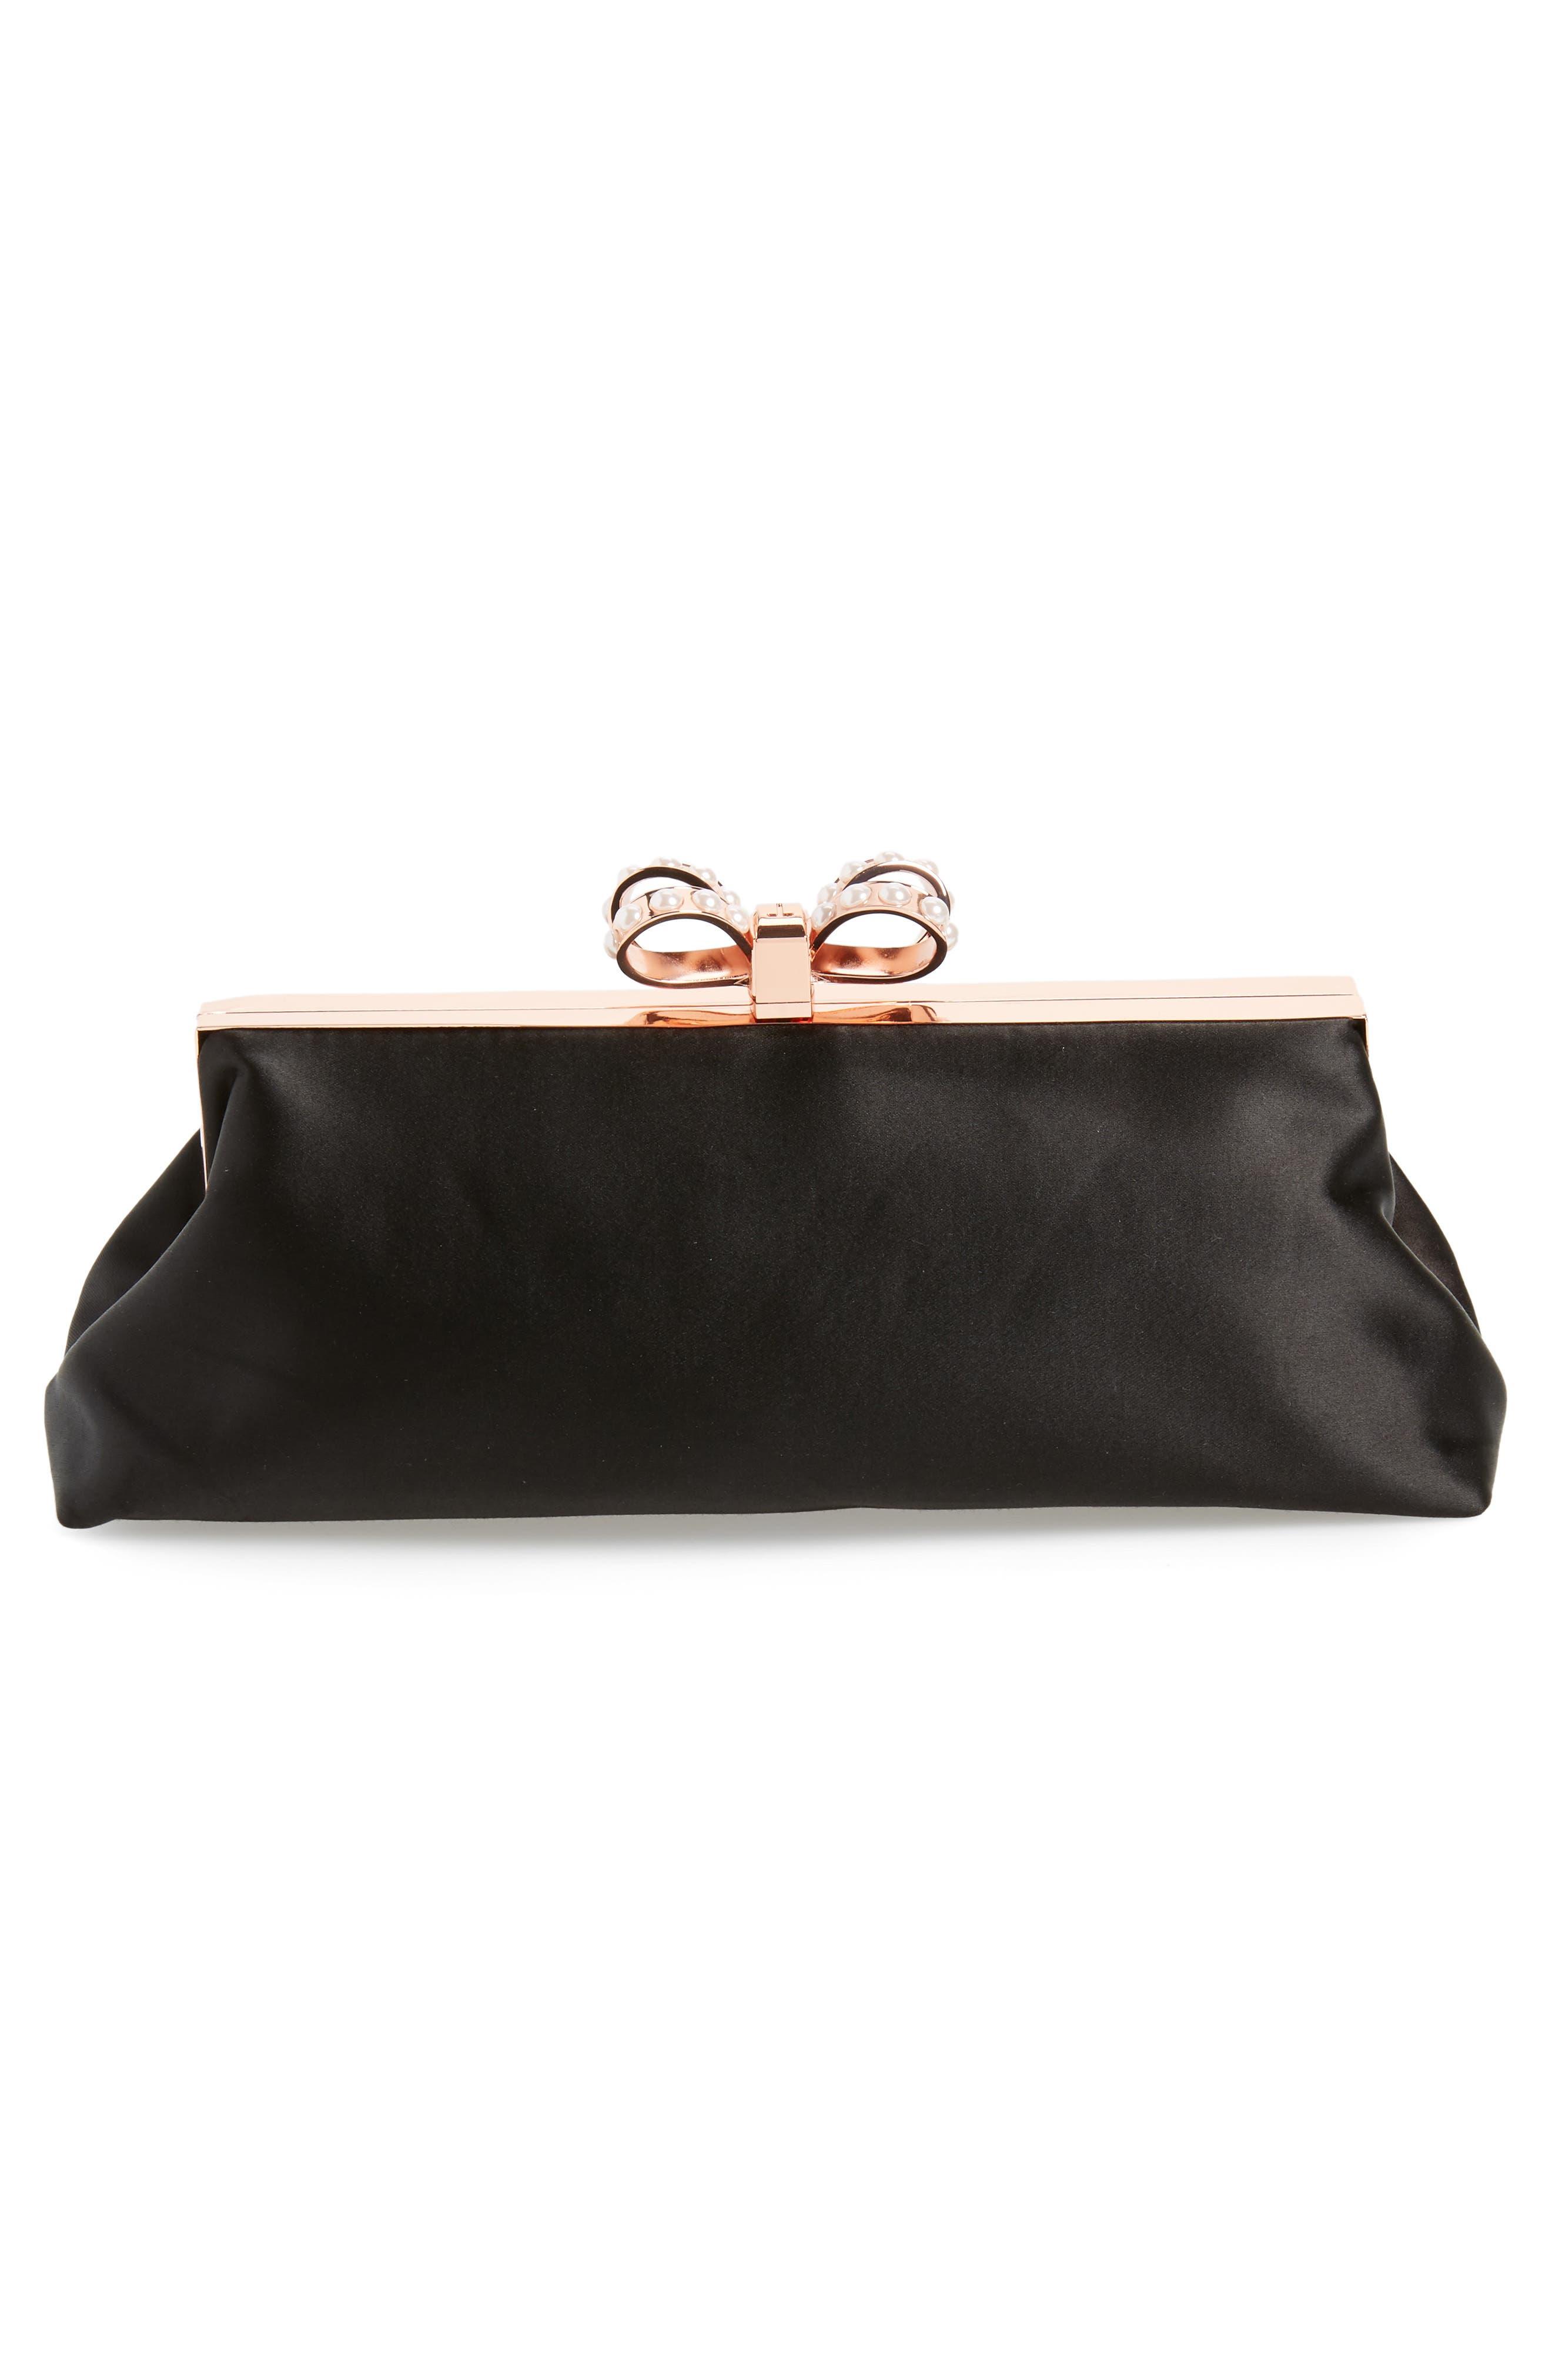 Georgaa Bow Clasp Evening Bag,                             Alternate thumbnail 3, color,                             Black